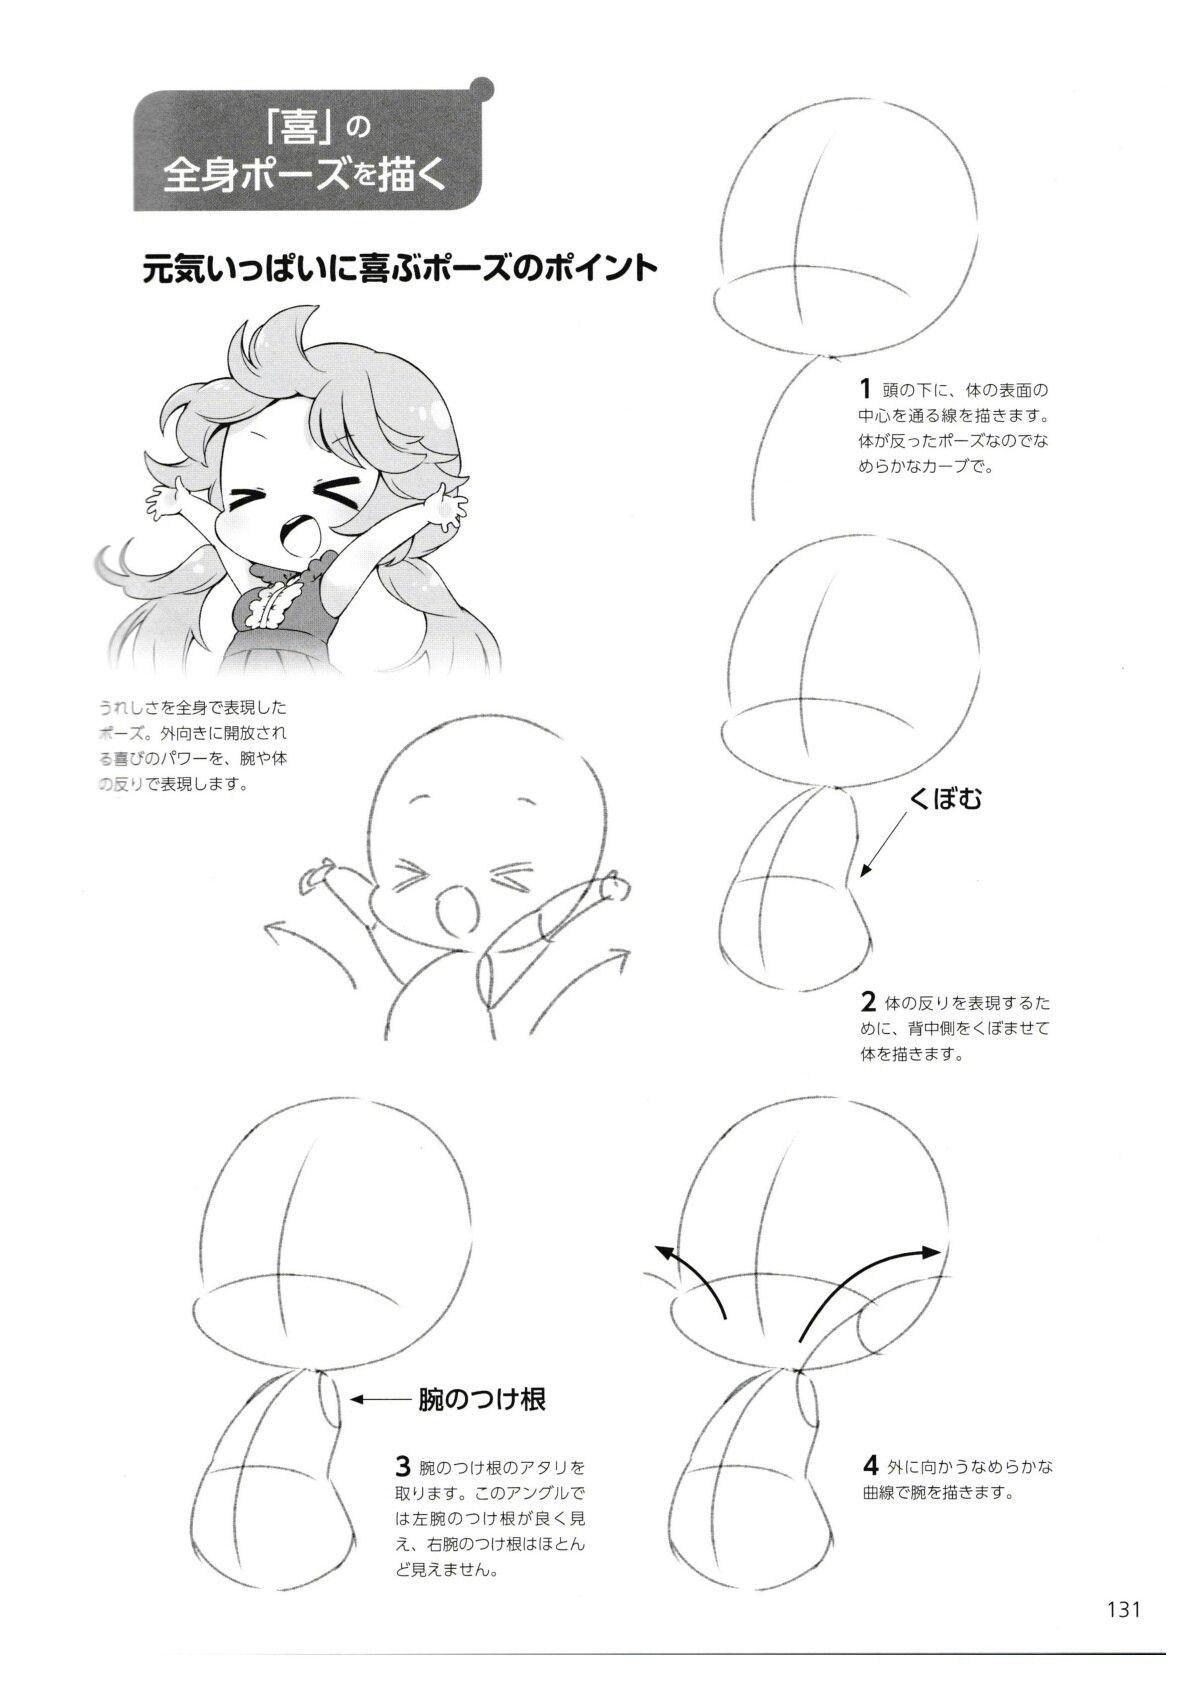 Pin By White Dandelion On Draw Inso 4 Chibi Sketch Anime Drawing Books Chibi Drawings